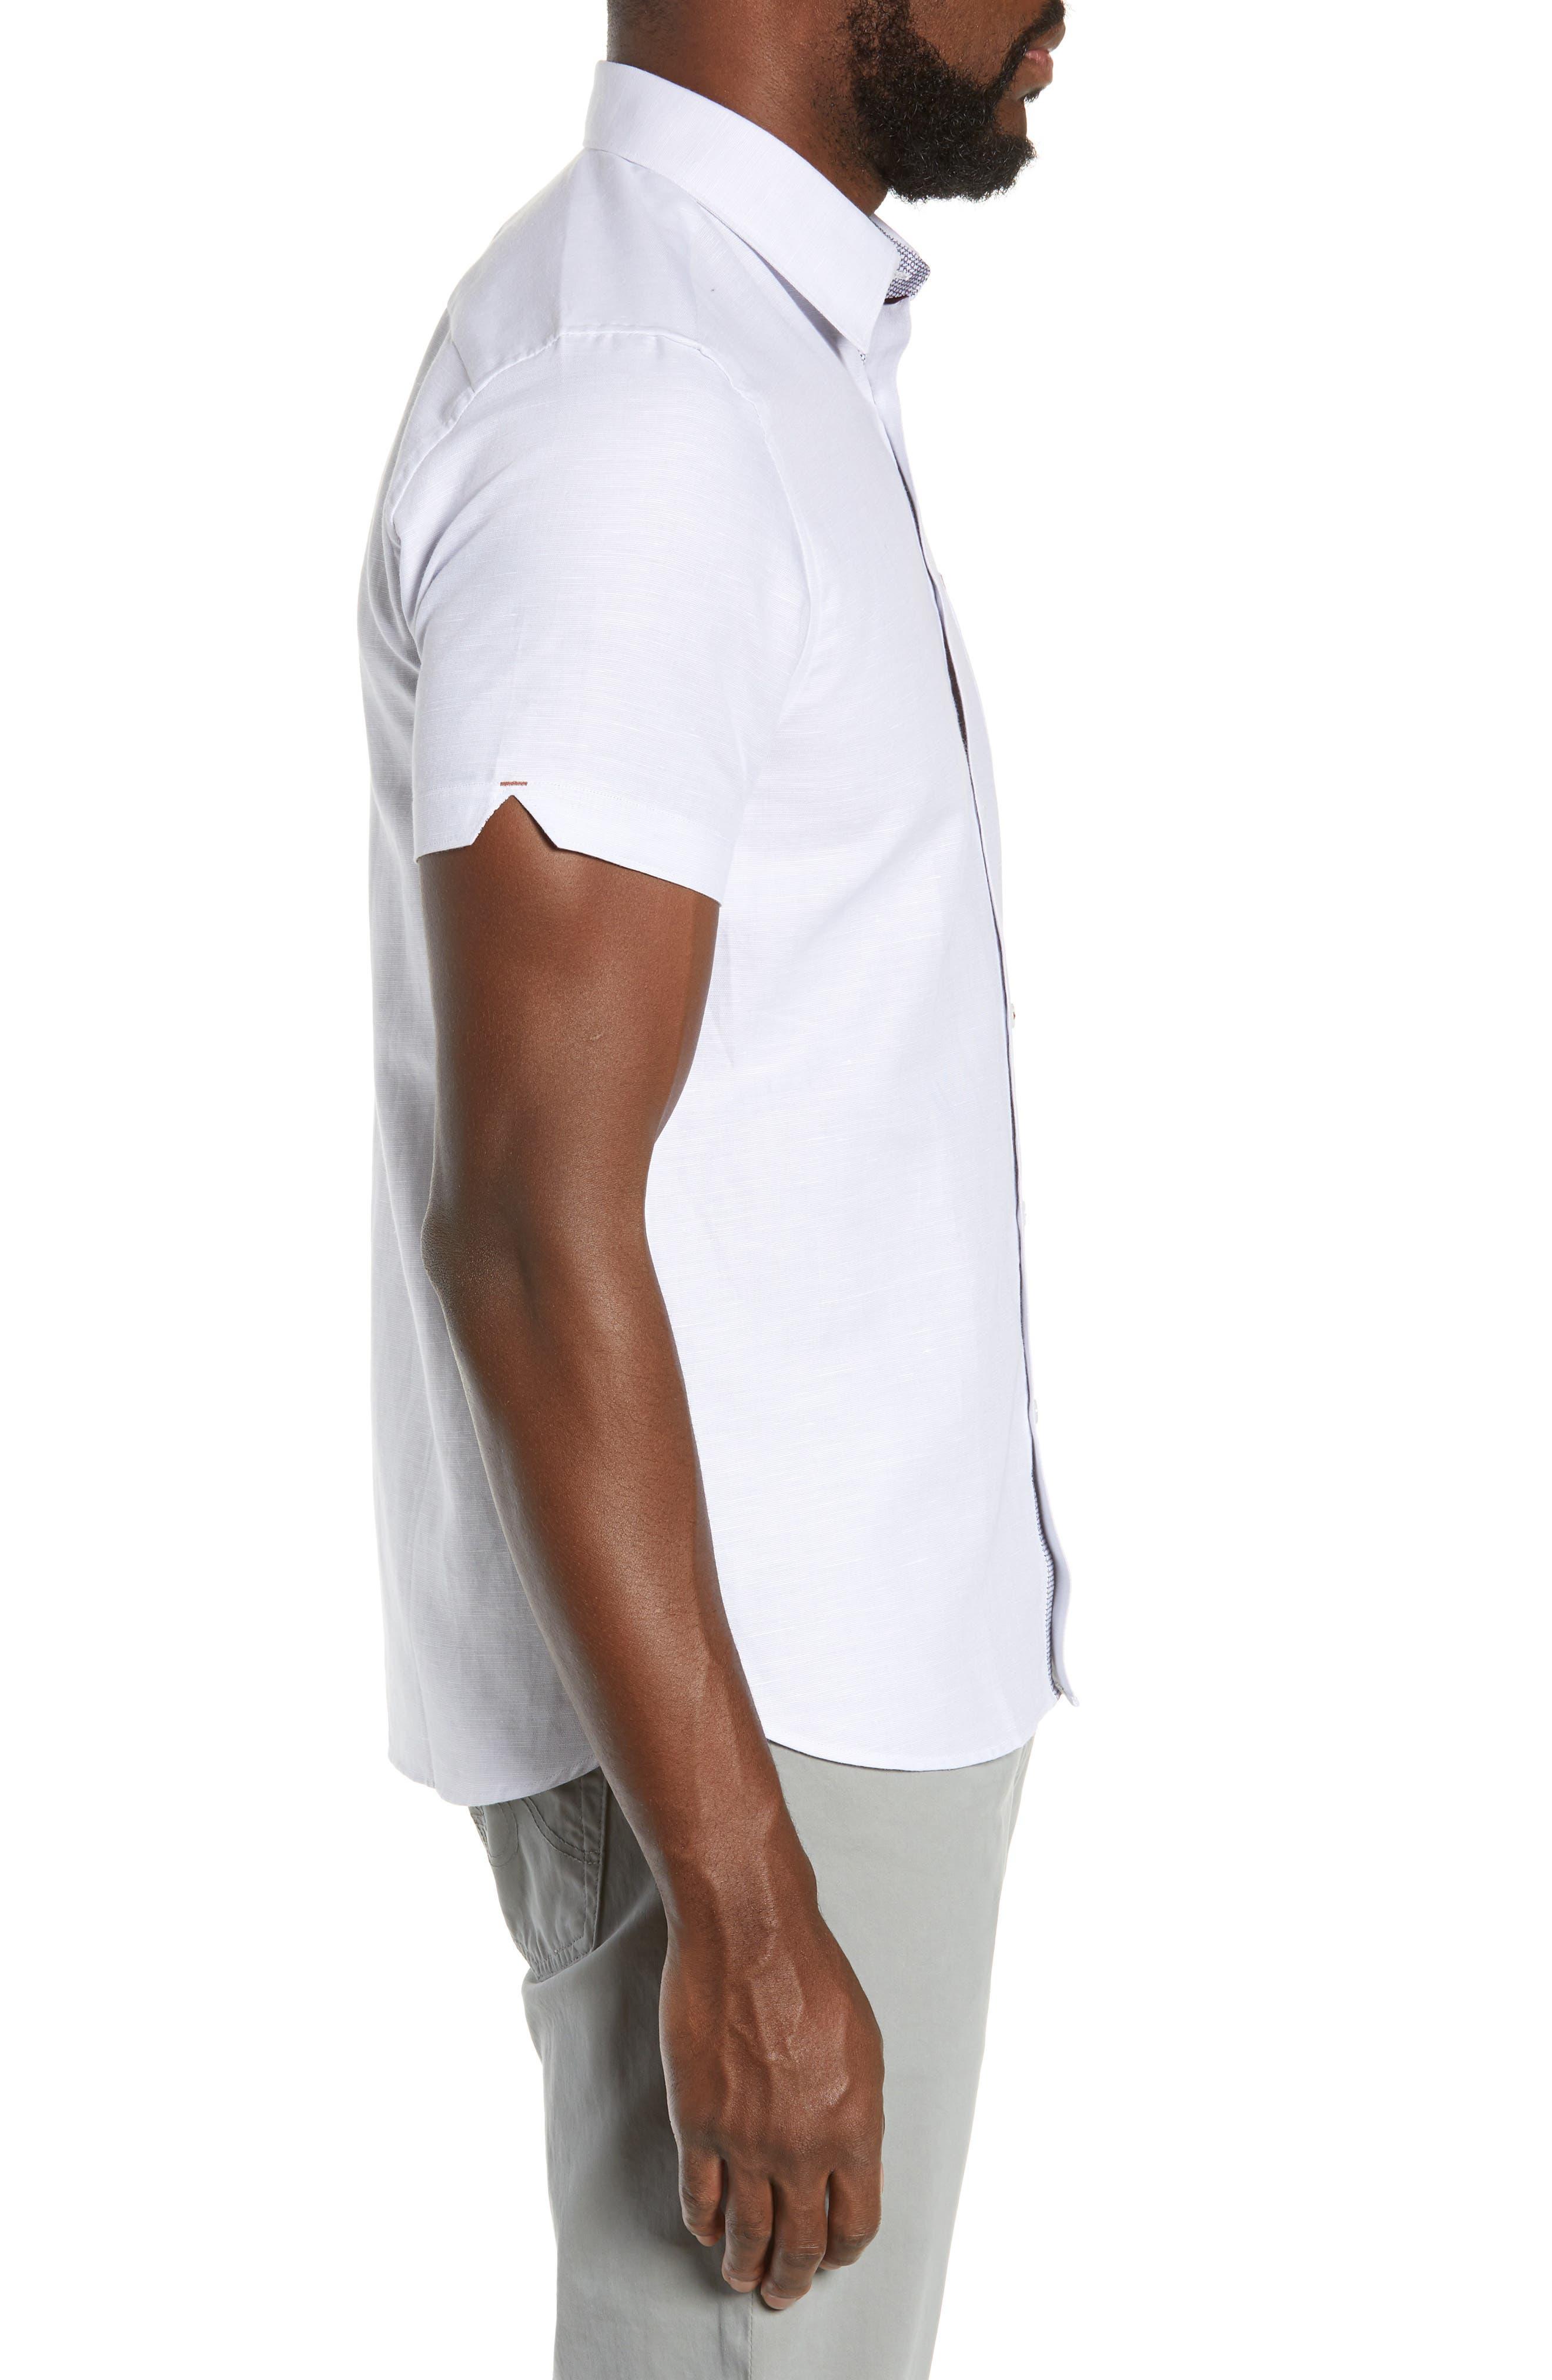 TED BAKER LONDON, Graphit Slim Fit Cotton & Linen Sport Shirt, Alternate thumbnail 4, color, GREY